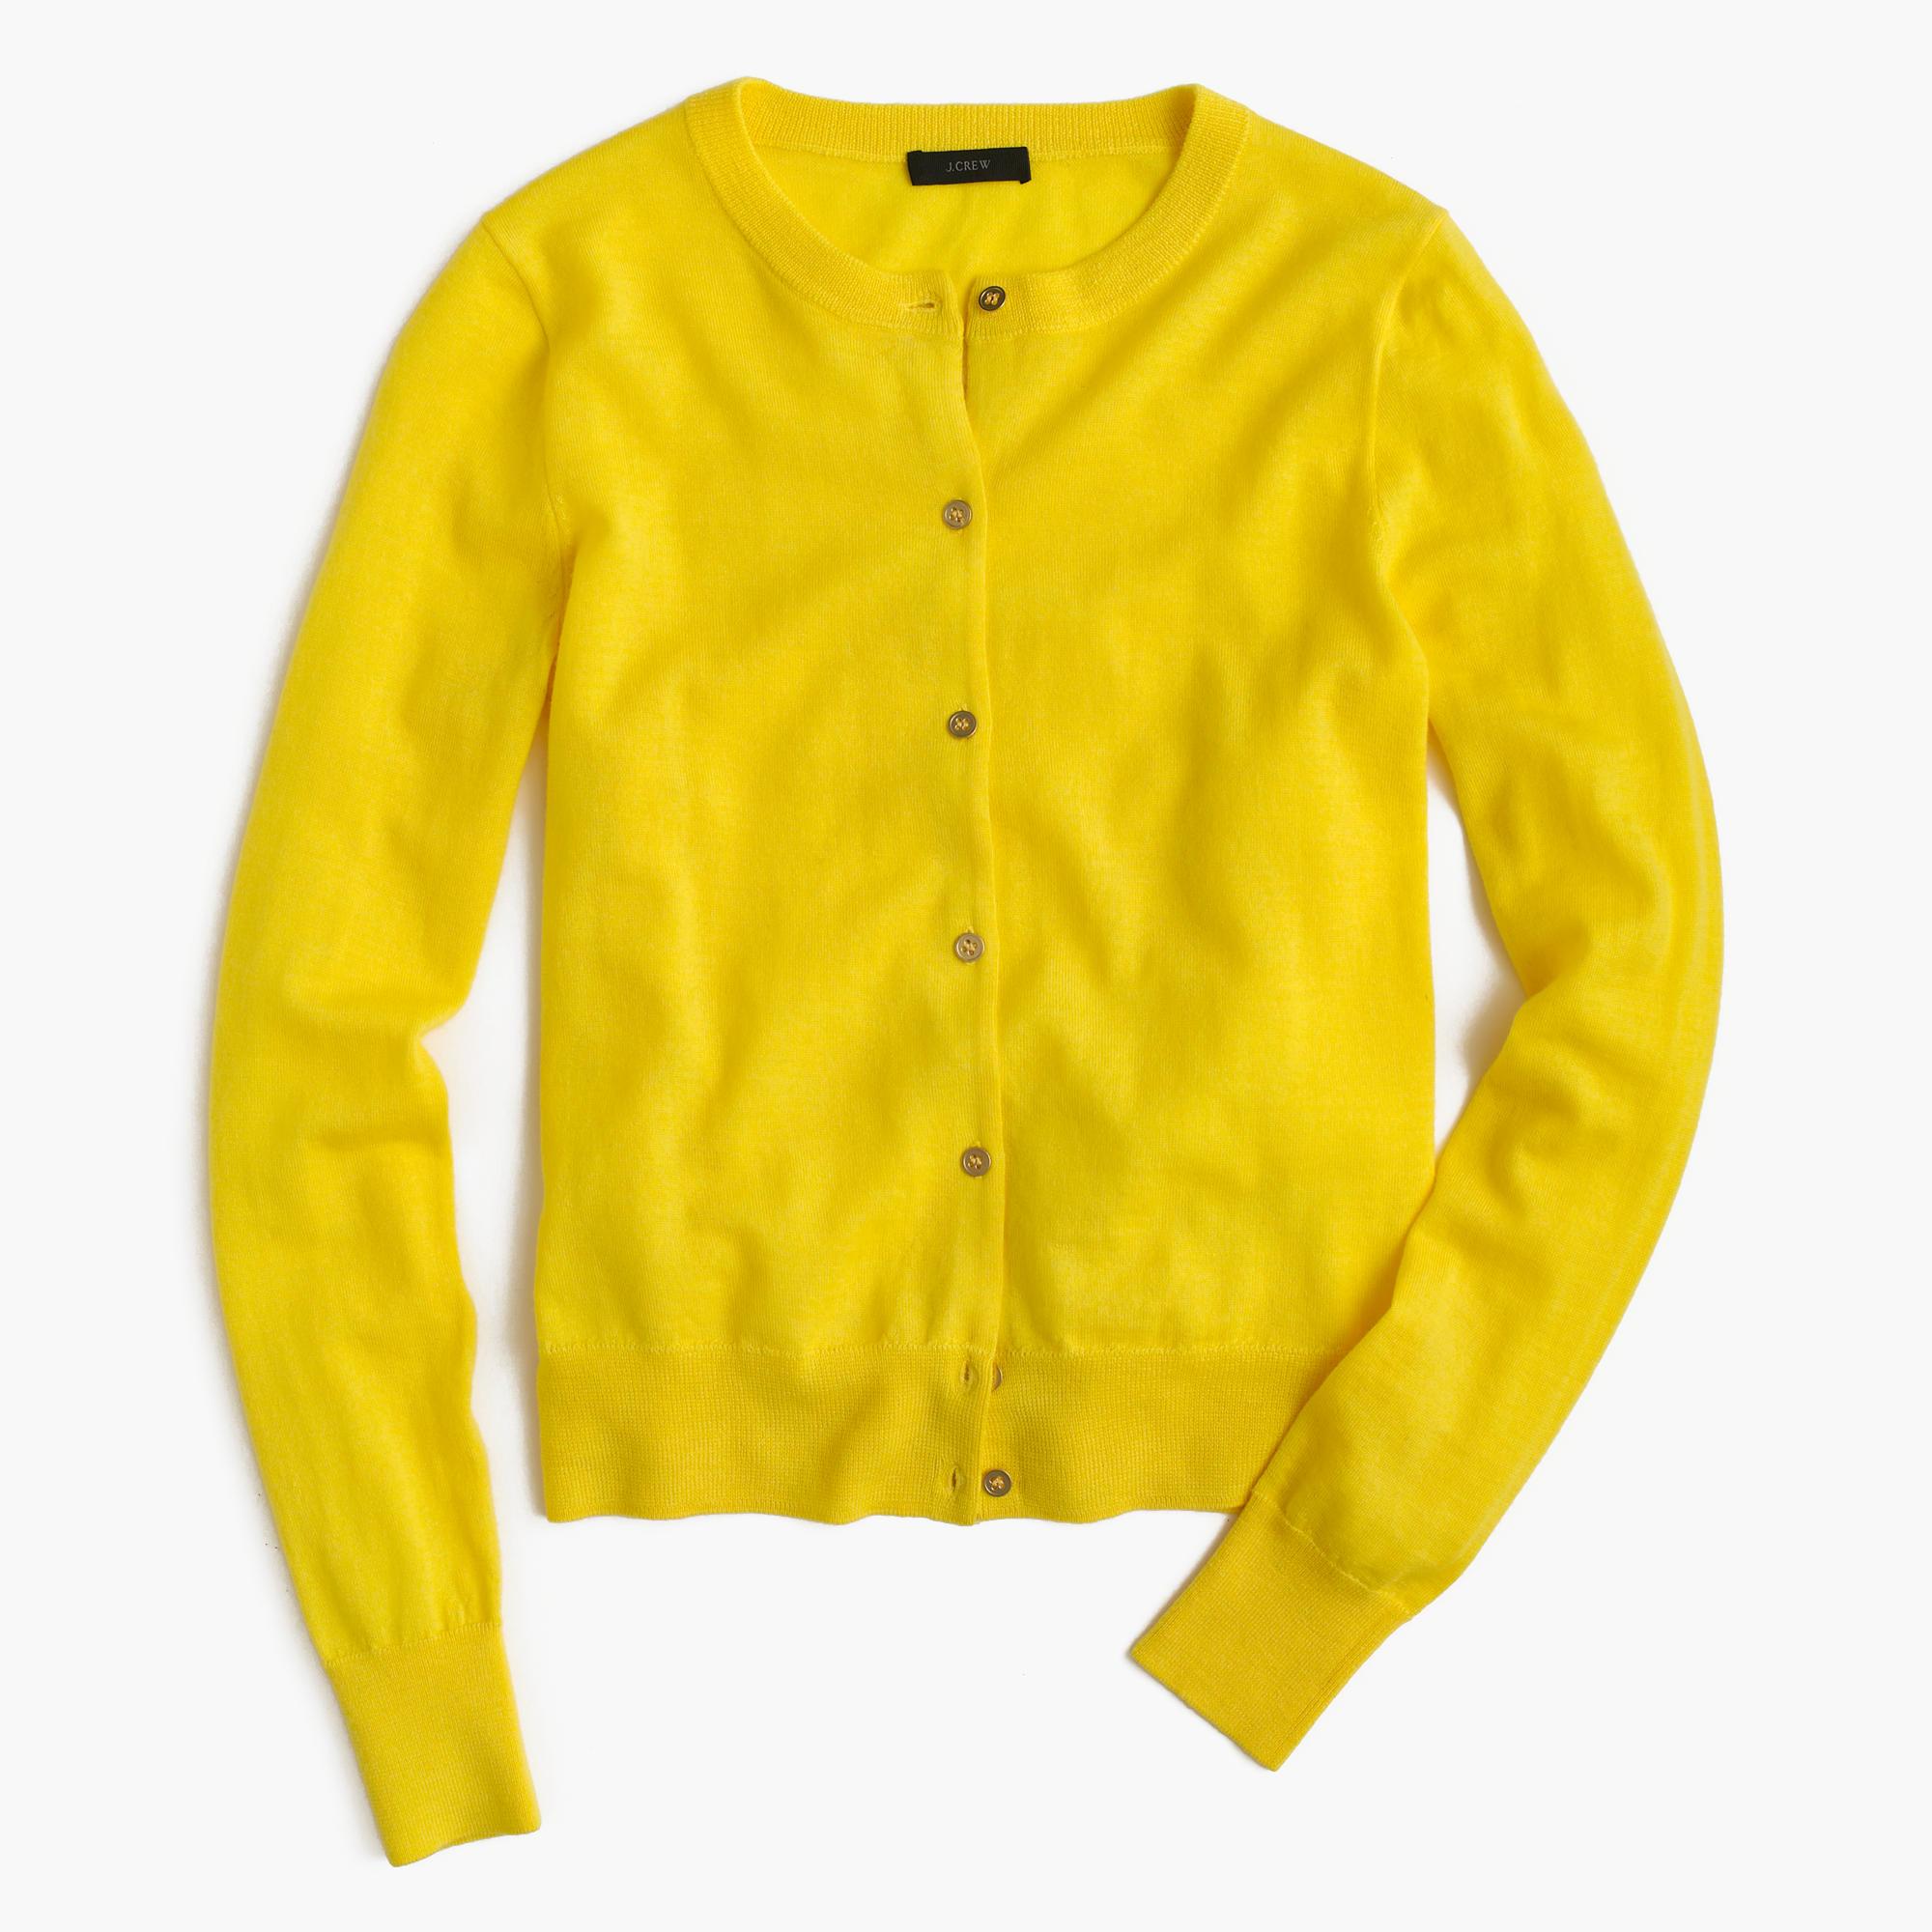 e75860a19878 J.Crew Lightweight Wool Jackie Cardigan Sweater in Yellow - Lyst